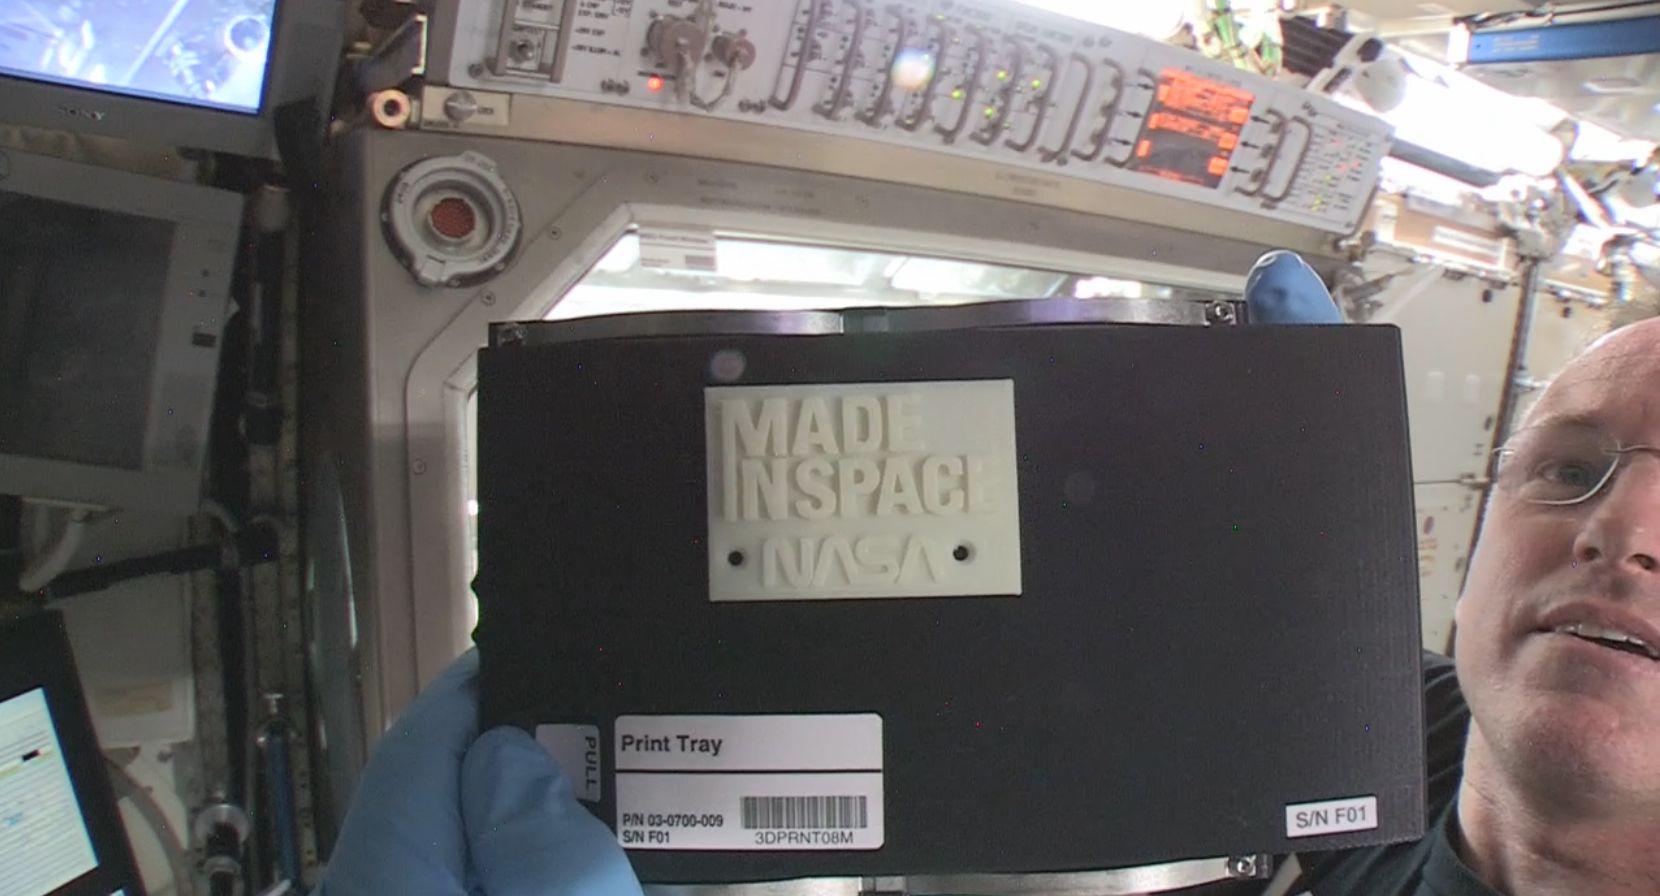 Space Station's 3D Printer Makes 1st Part